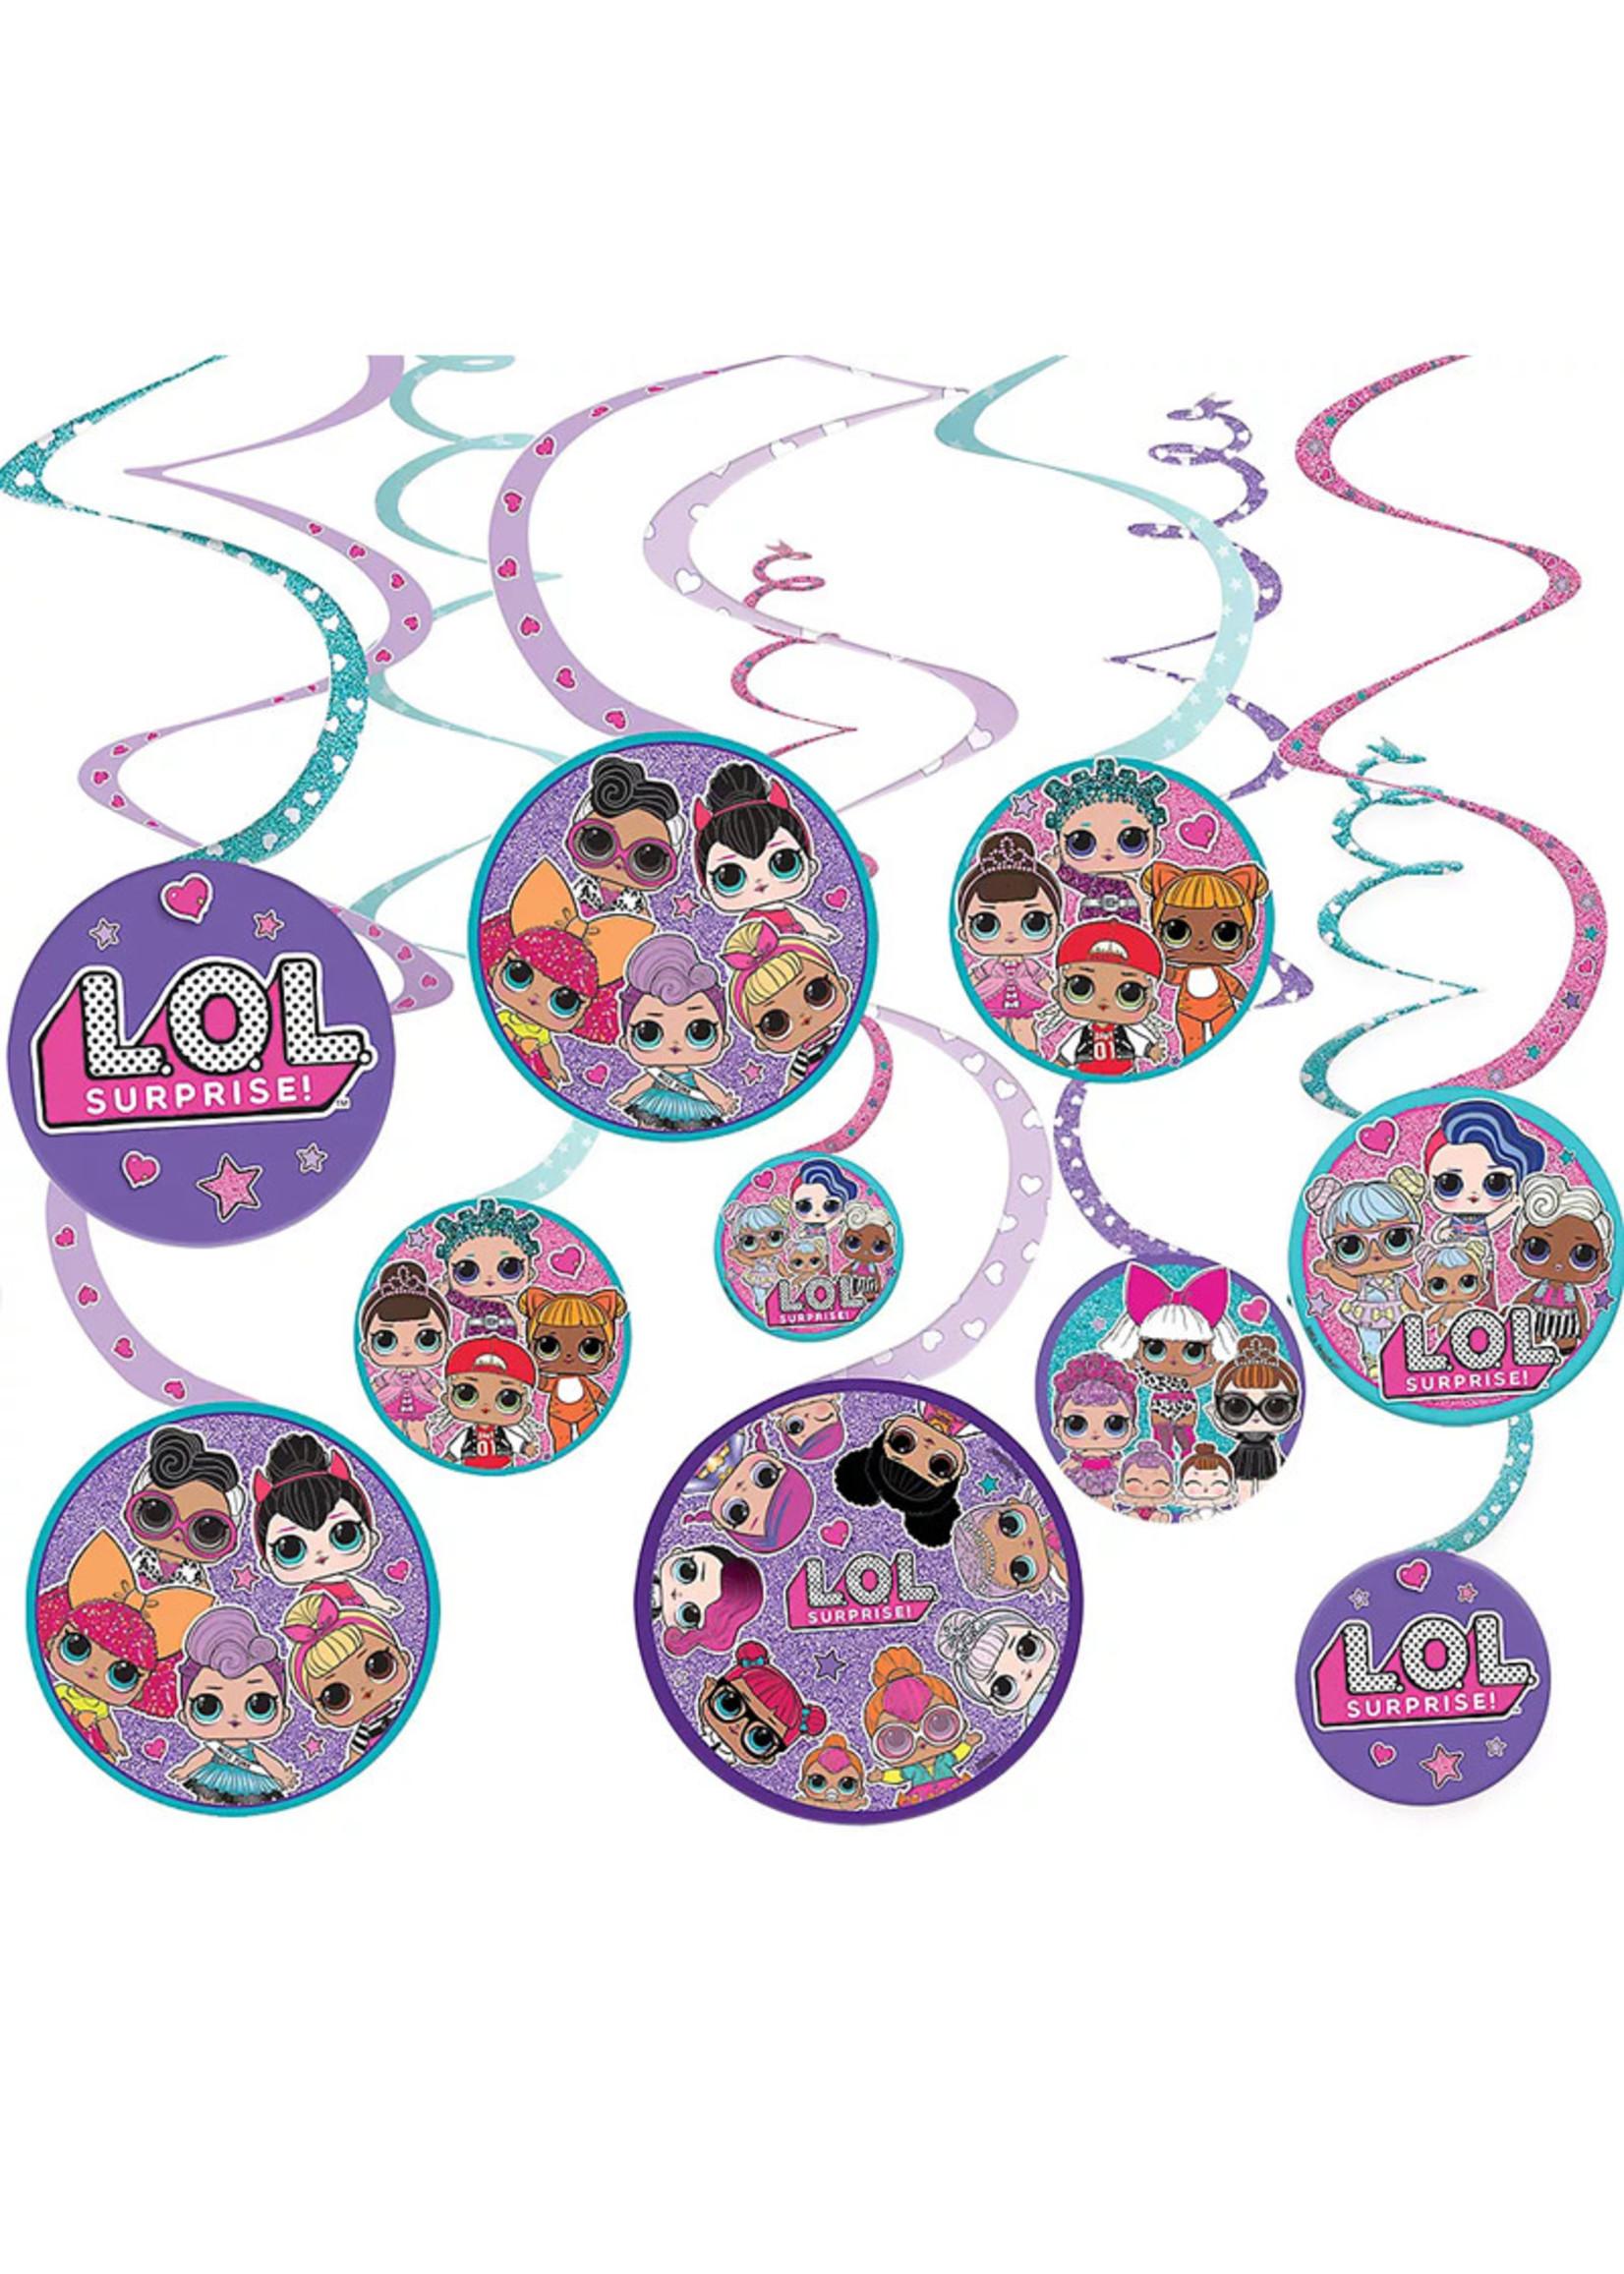 L.O.L. Surprise! Swirl Decorations 12ct